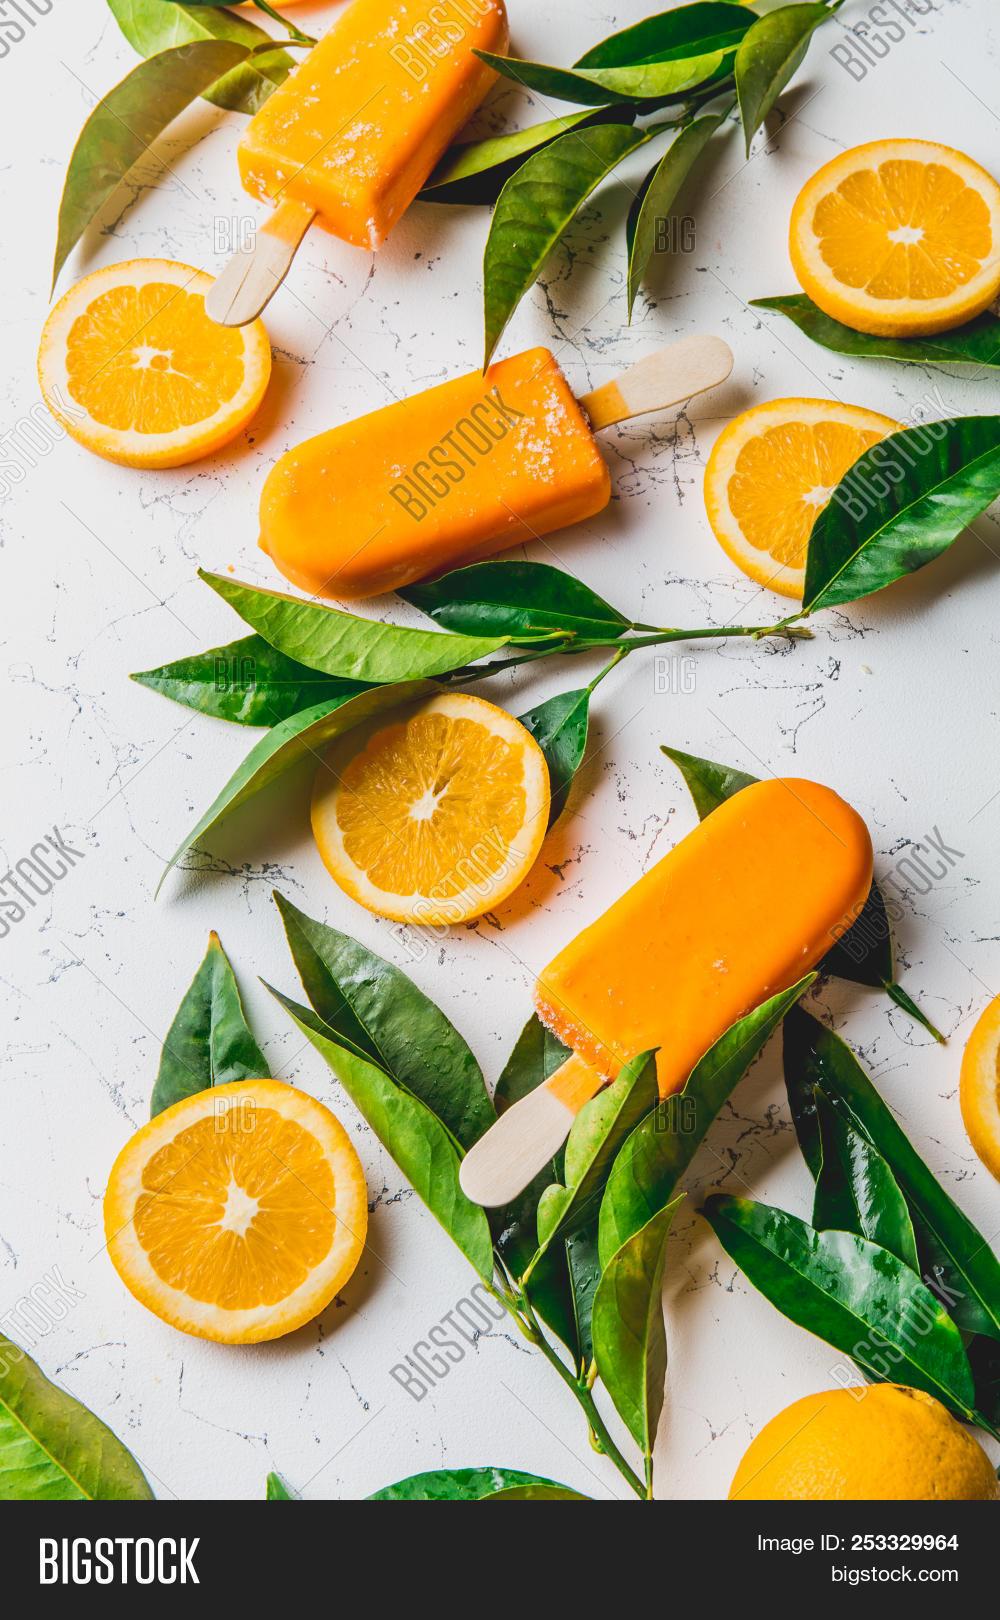 Homemade Orange Ice Image Photo Free Trial Bigstock